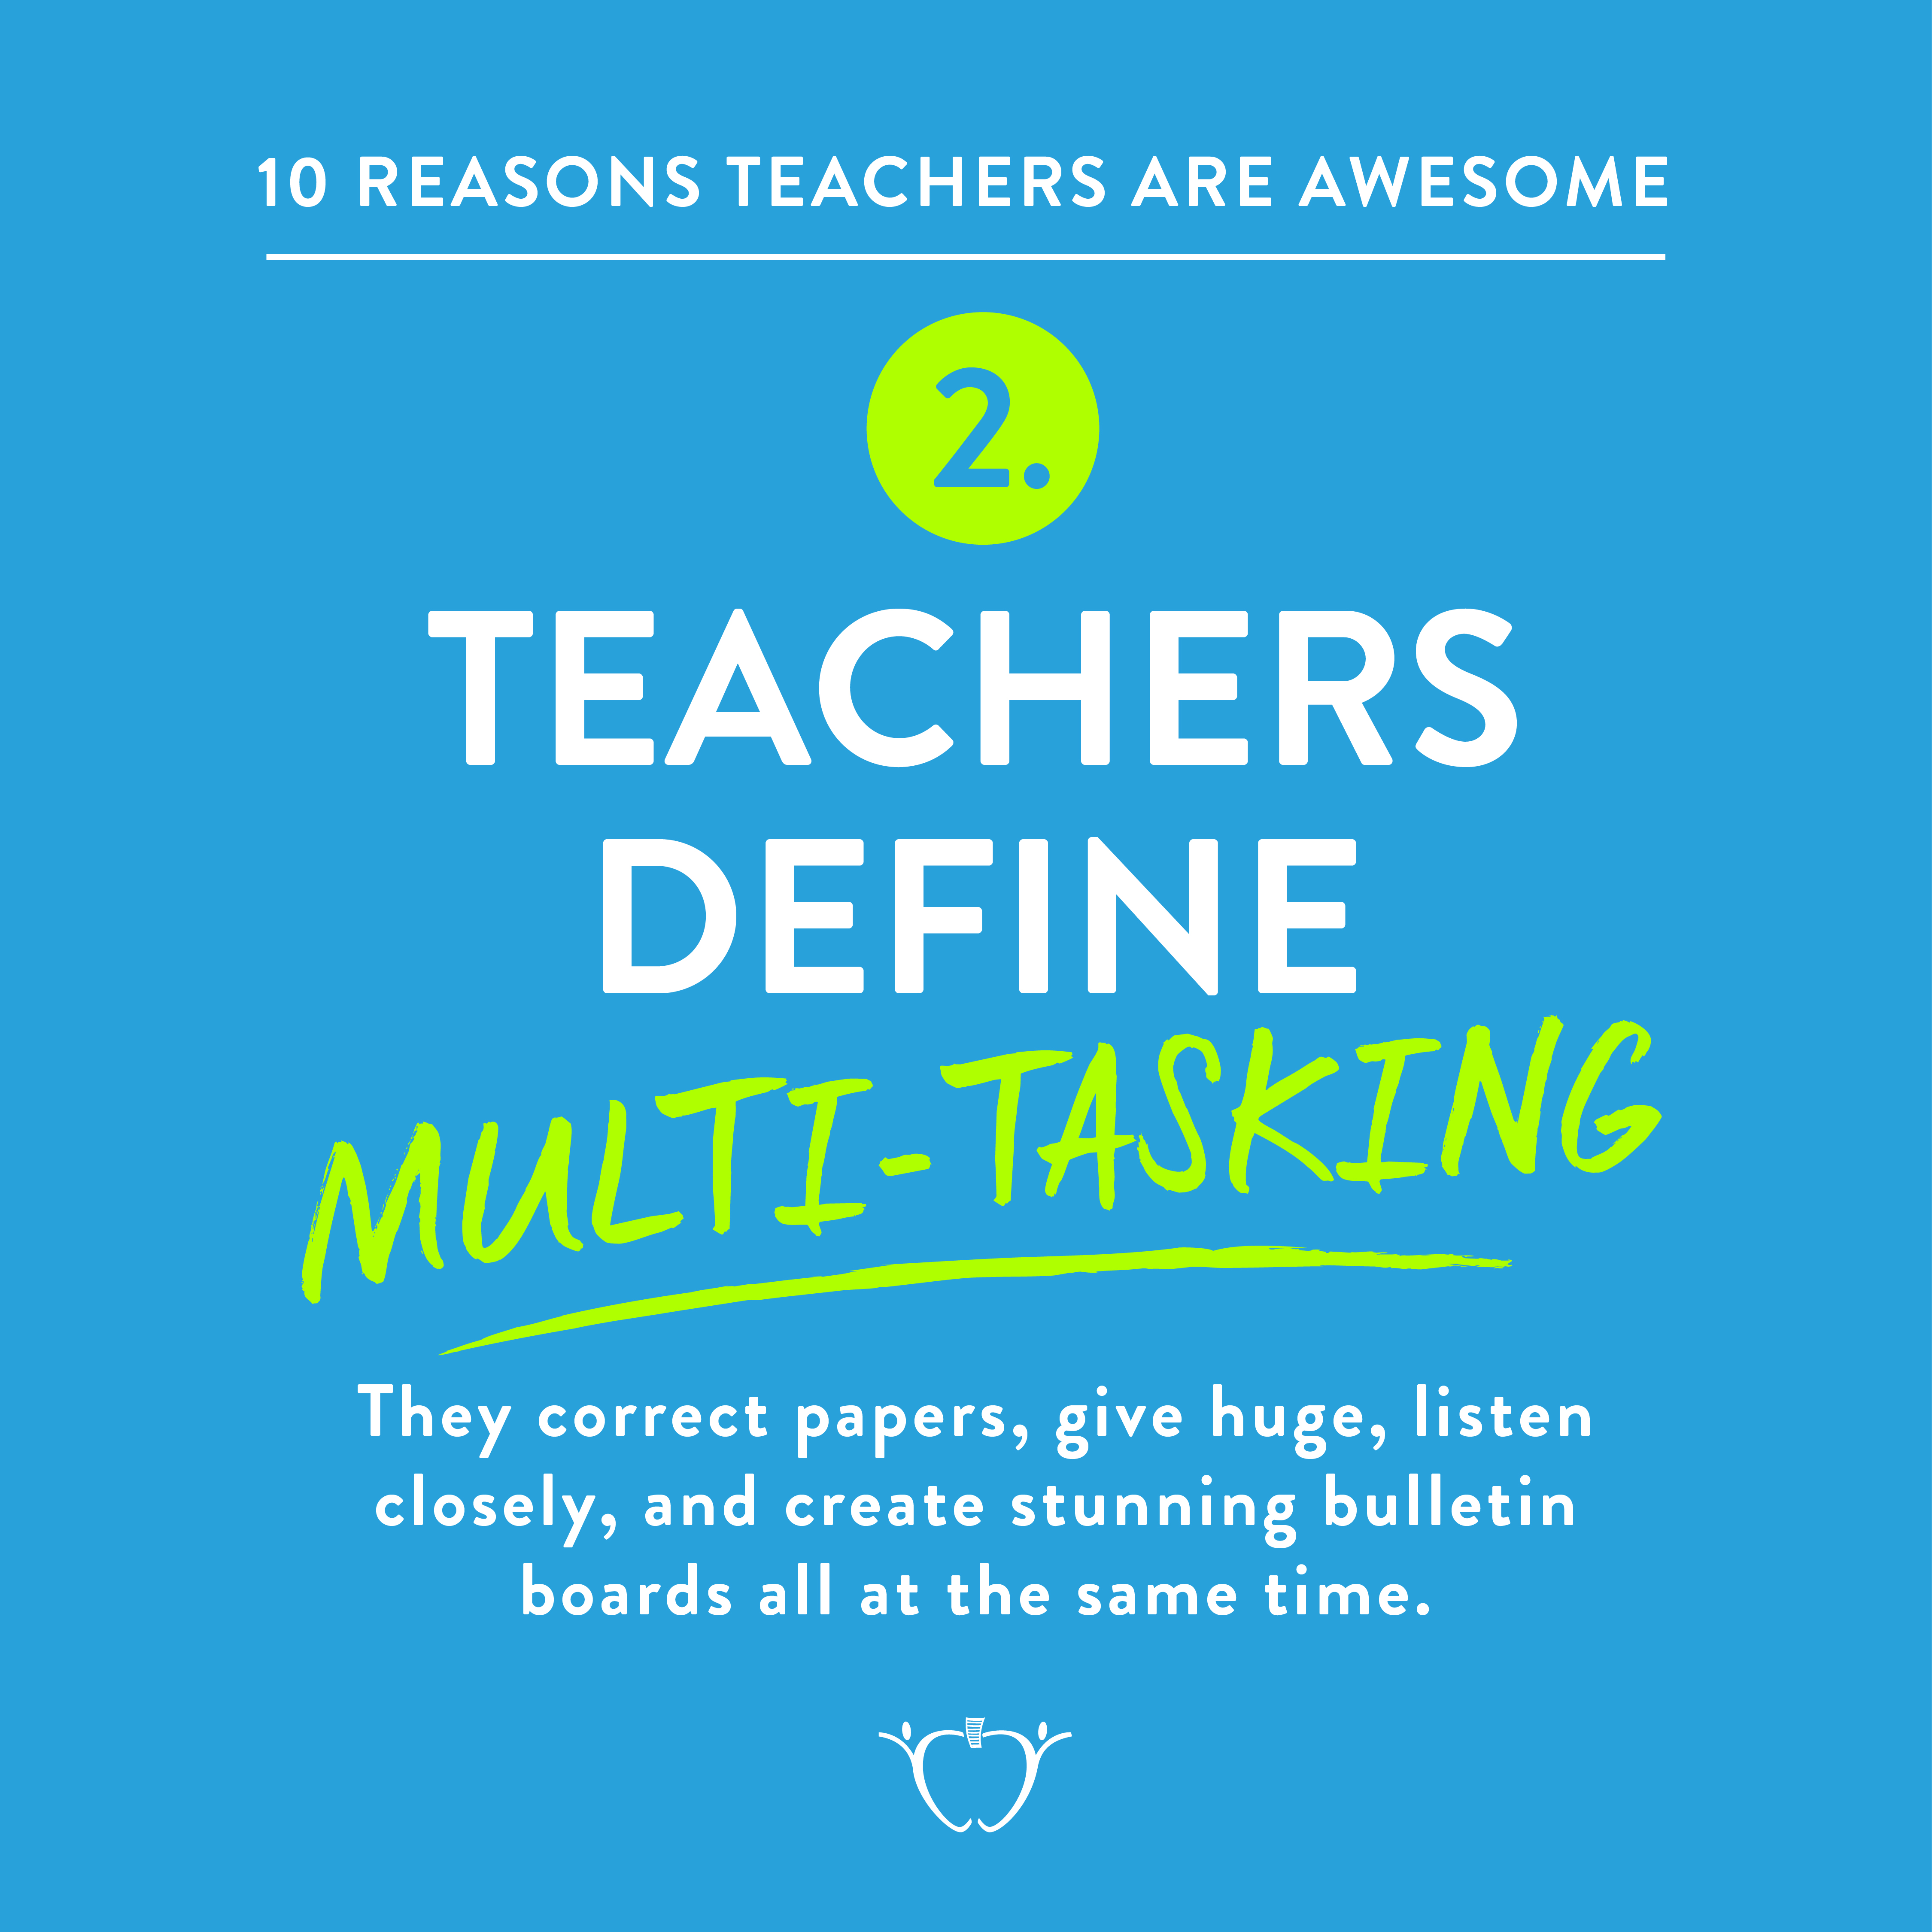 10 Reasons Teachers are Awesome by Teachers Pay Teachers